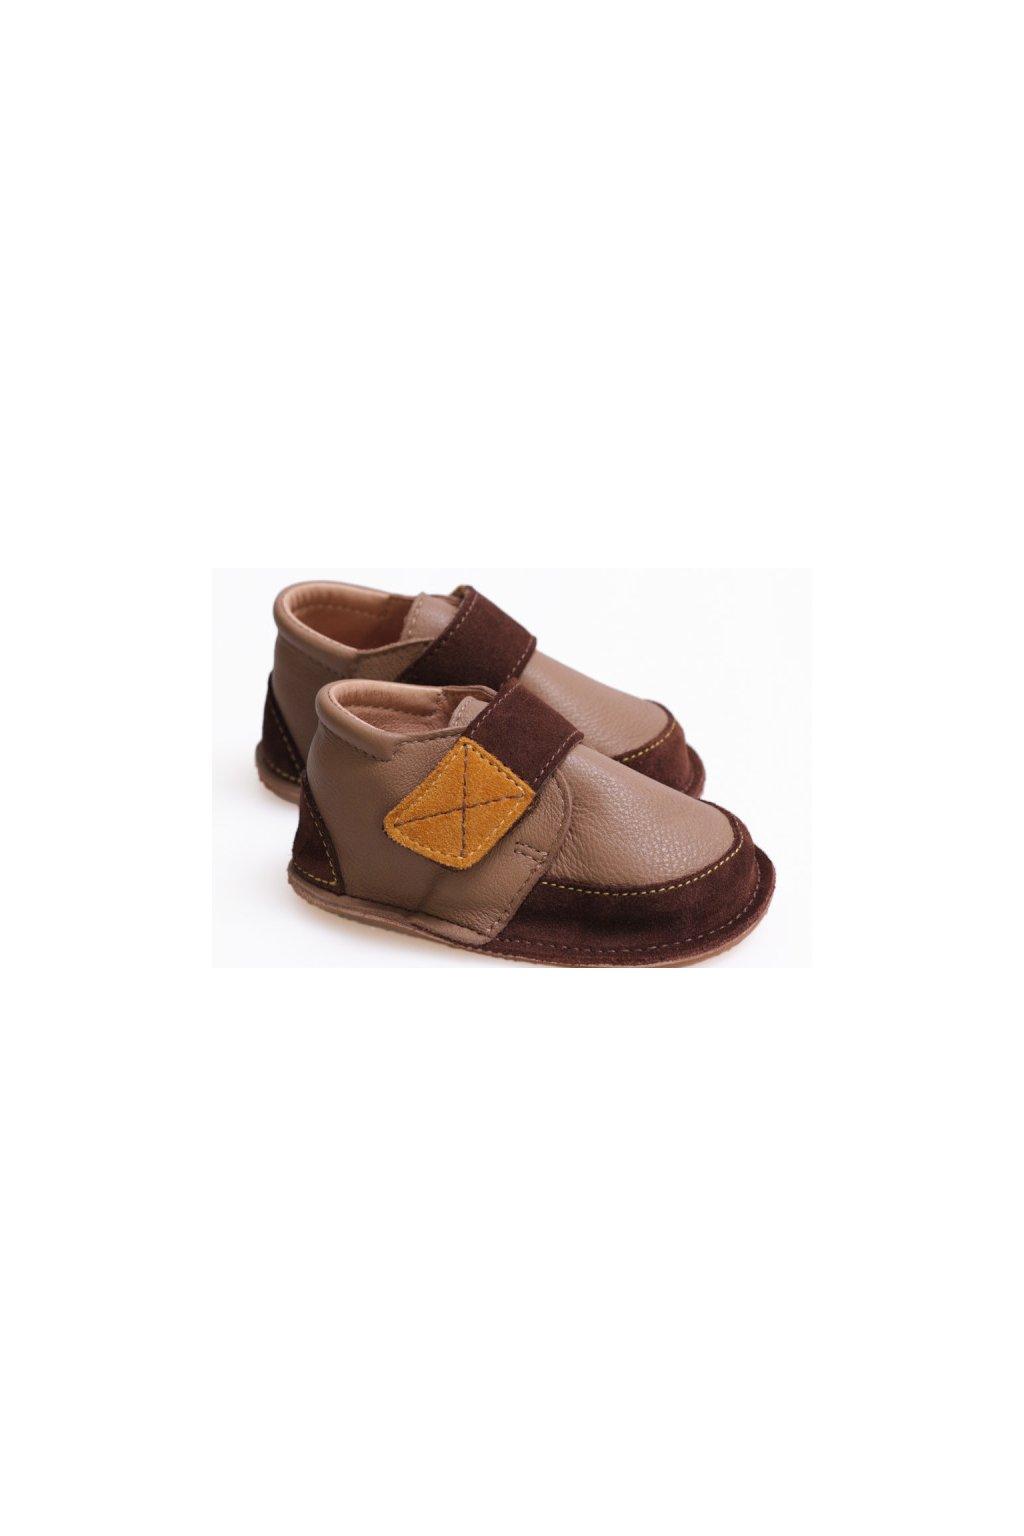 Tikki Vibram boots - Brown Delight